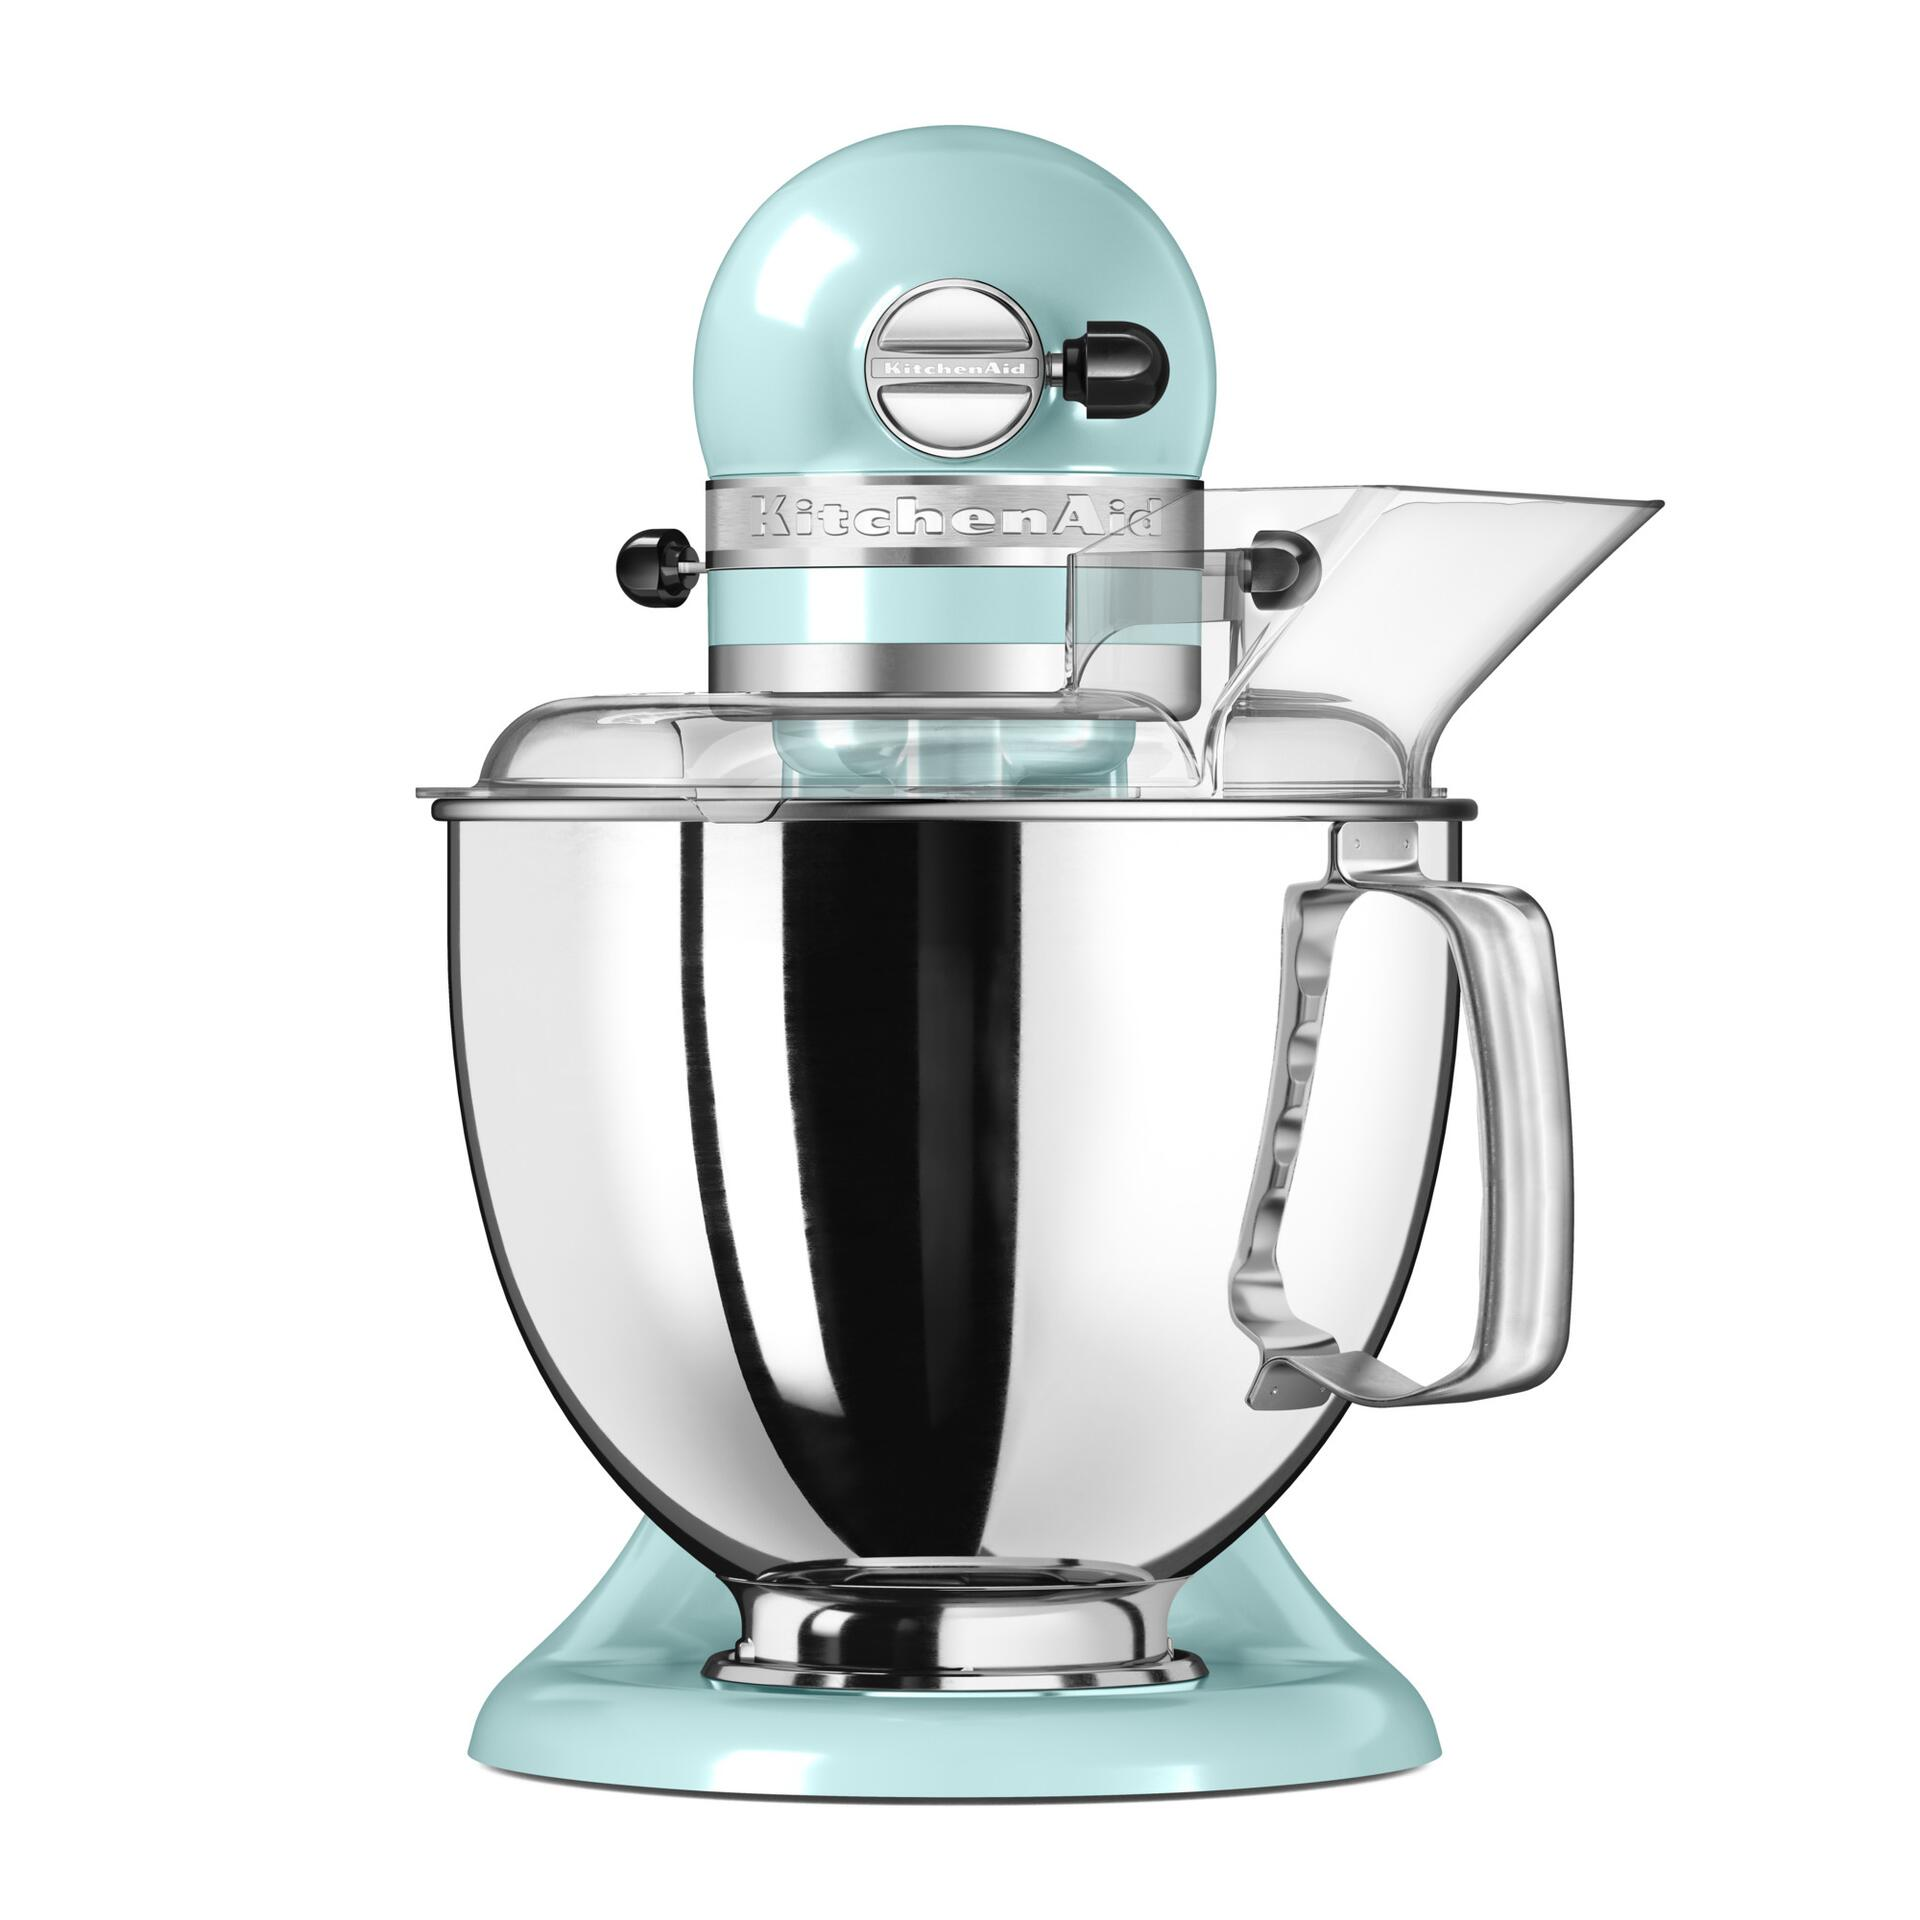 Kitchenaid Küchenmaschine Eisblau 5KSM175PSEIC